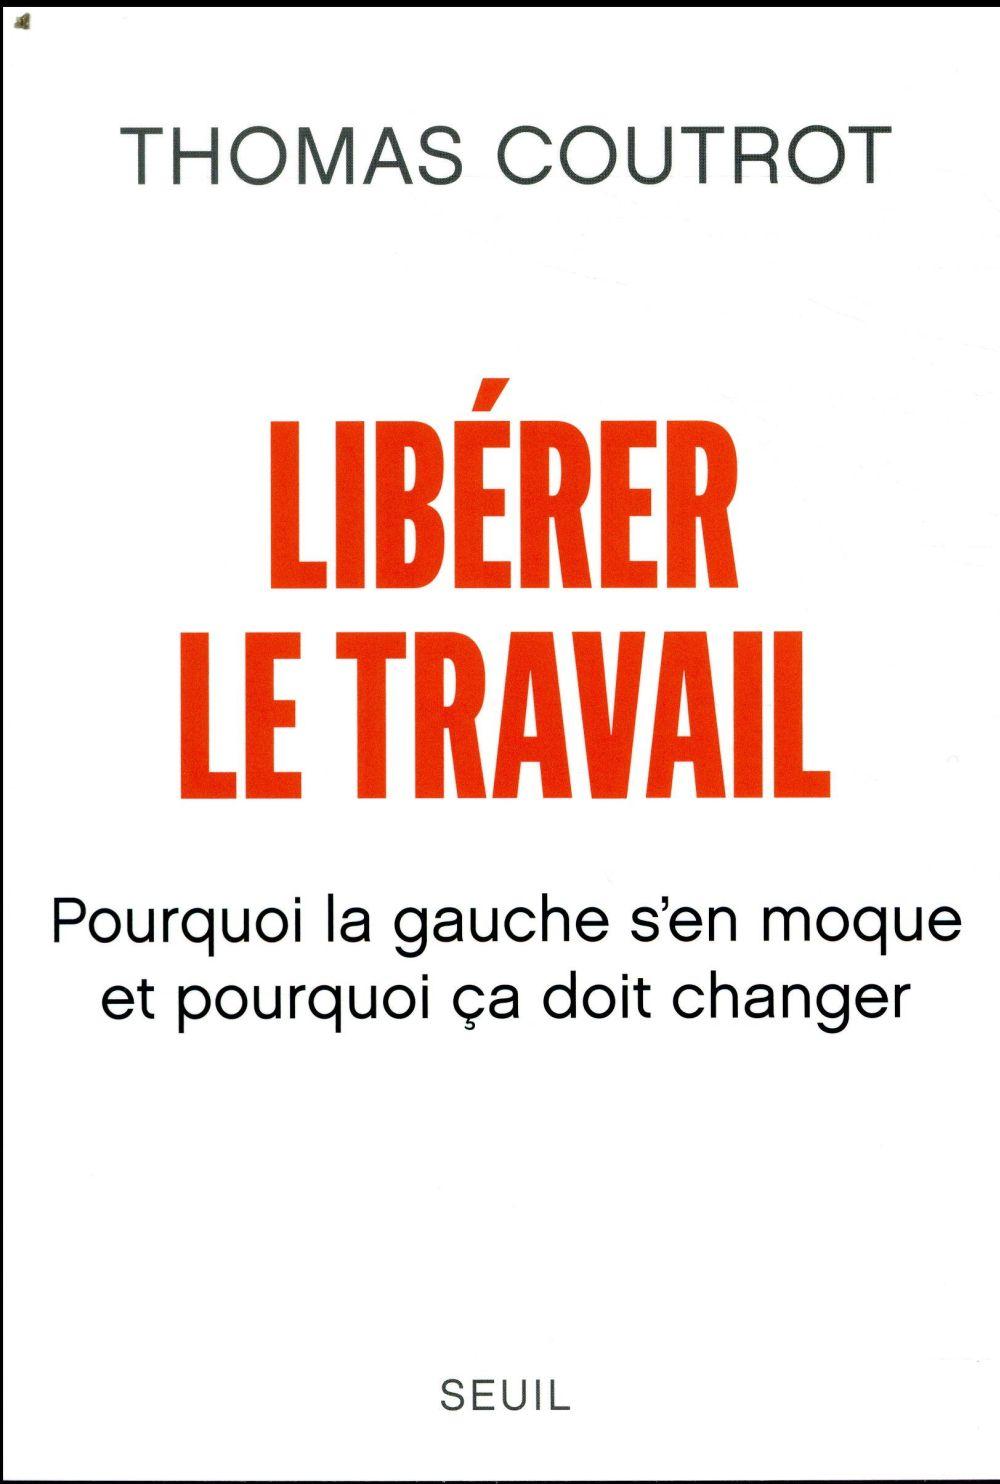 LIBERER LE TRAVAIL